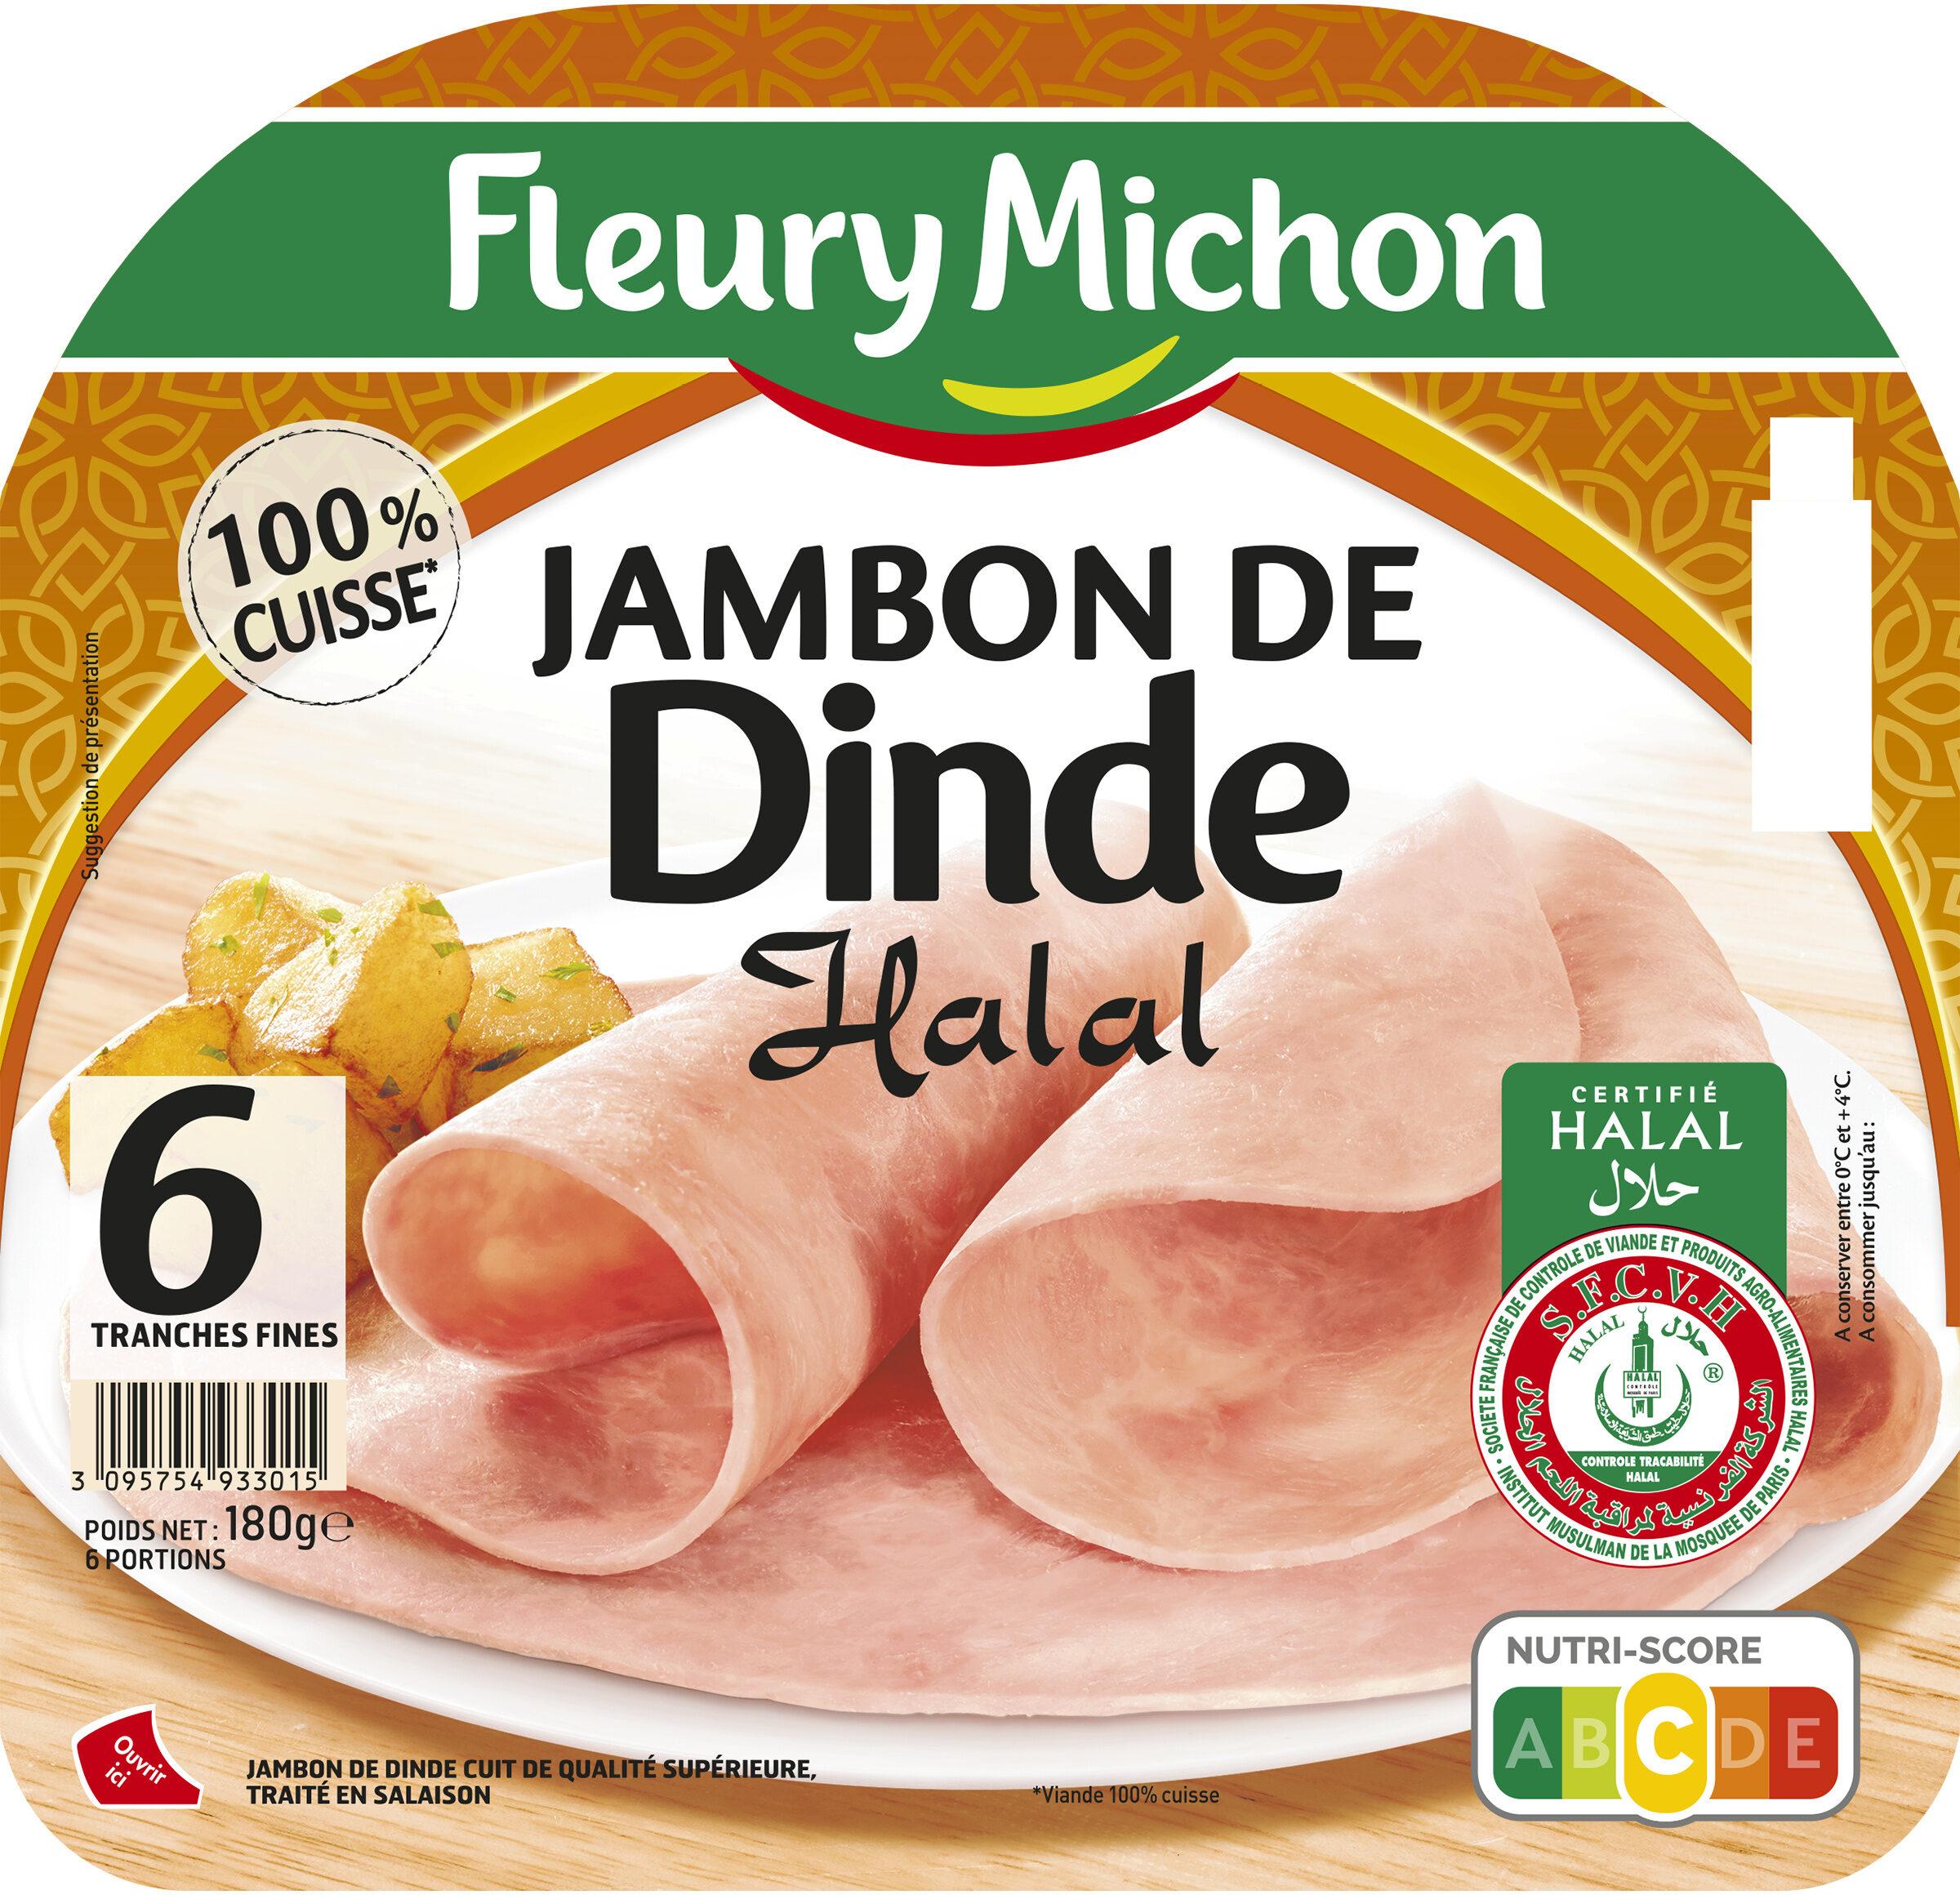 Jambon de Dinde - Halal - Product - fr